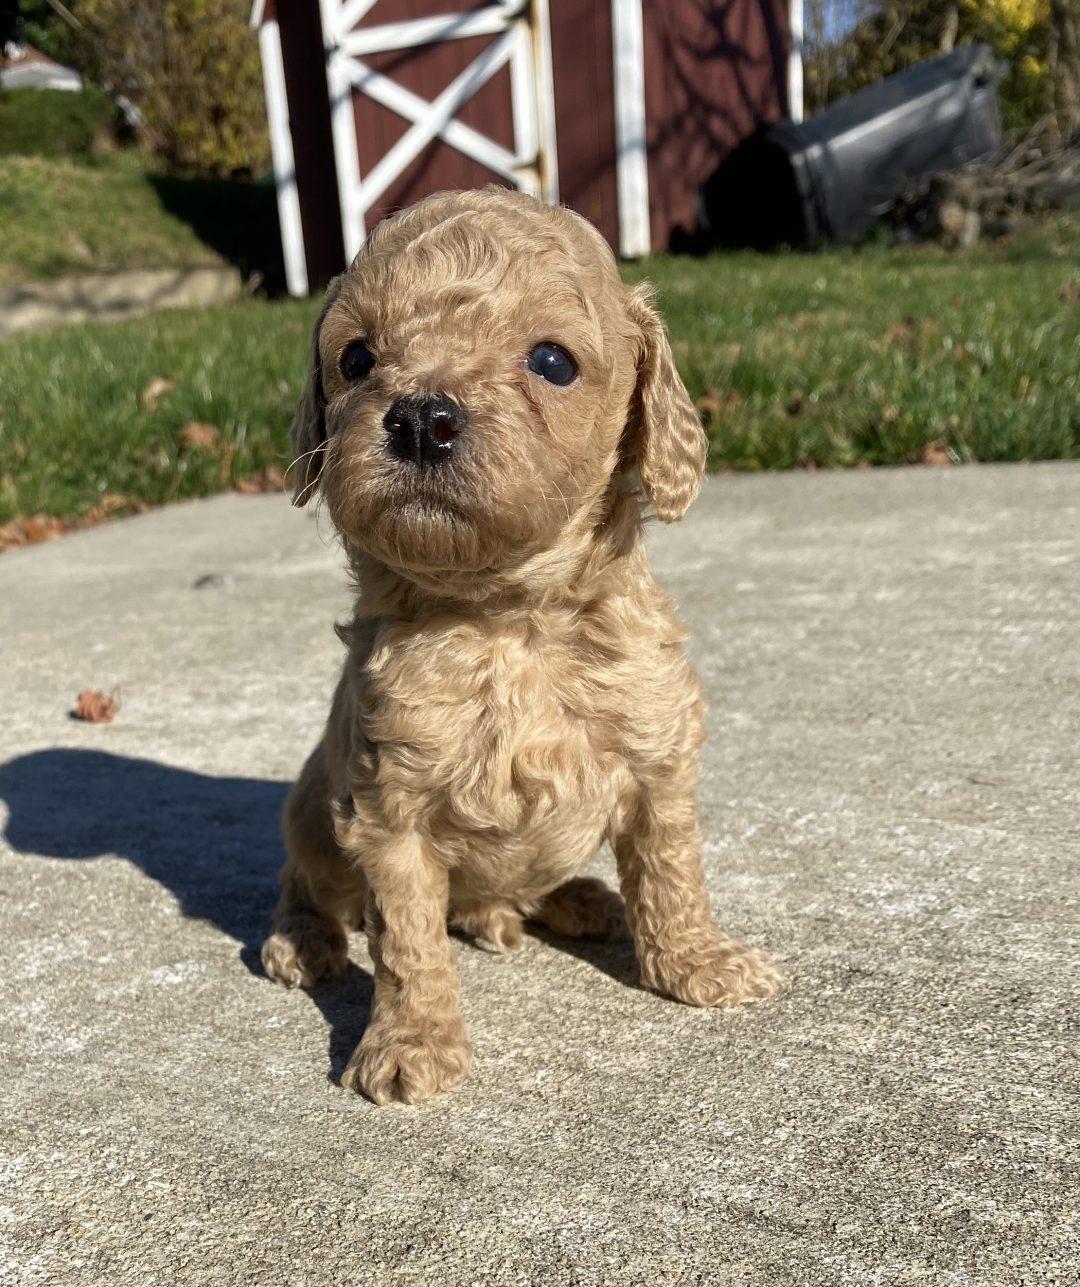 Liam - ICA Miniature Poodle doggie for sale at Harrisburg, Pennsylvania